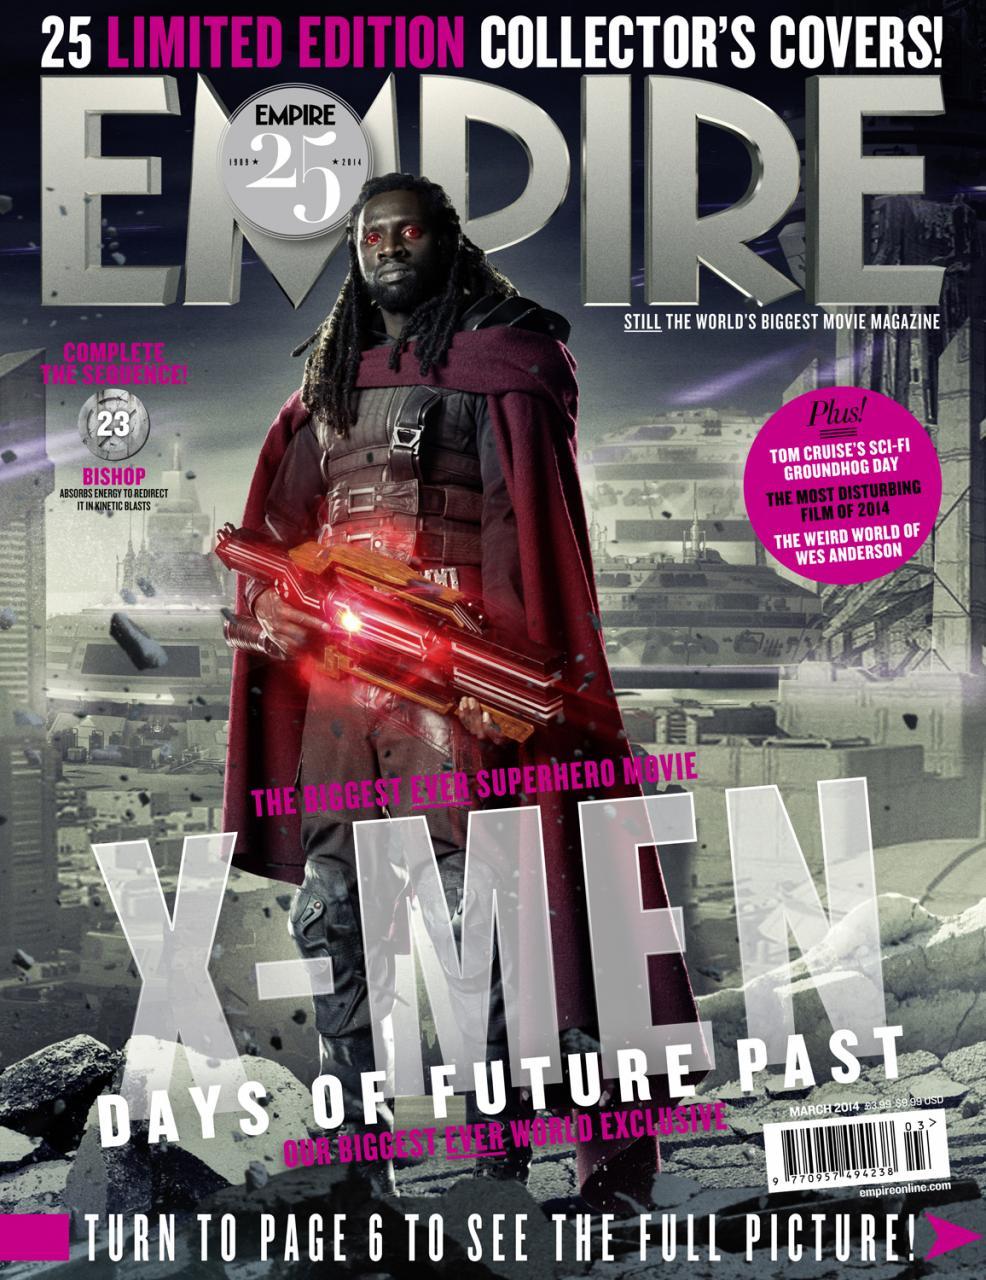 Empire Xmen Days Of Future Past Covers (7)